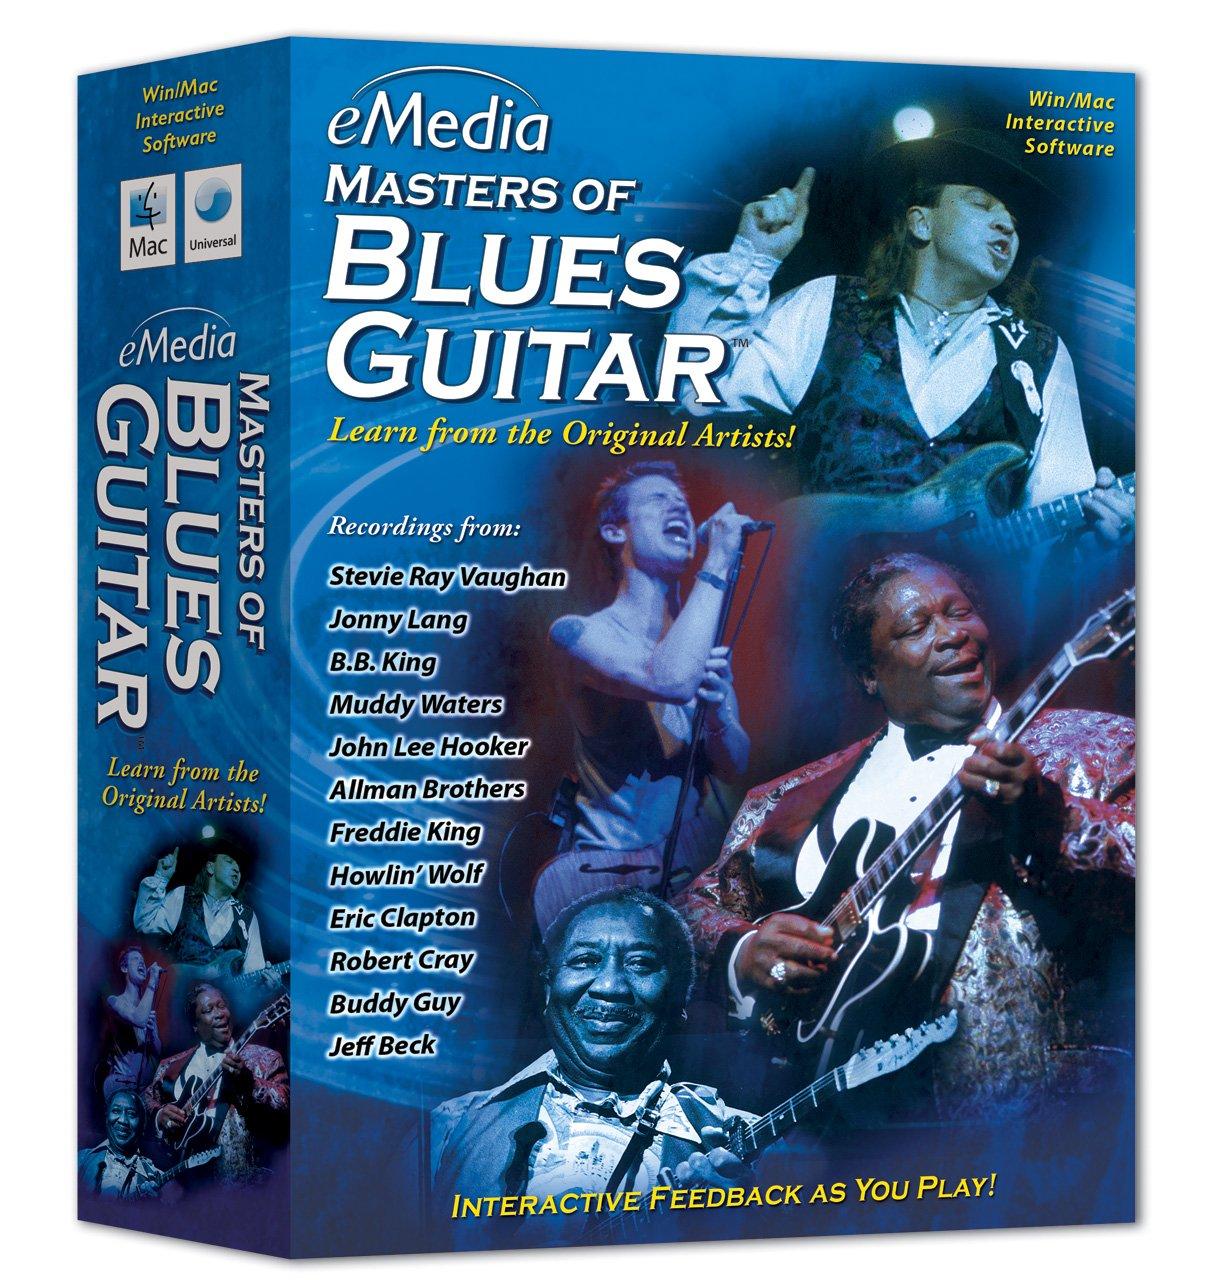 eMedia Masters of Blues Guitar by eMedia